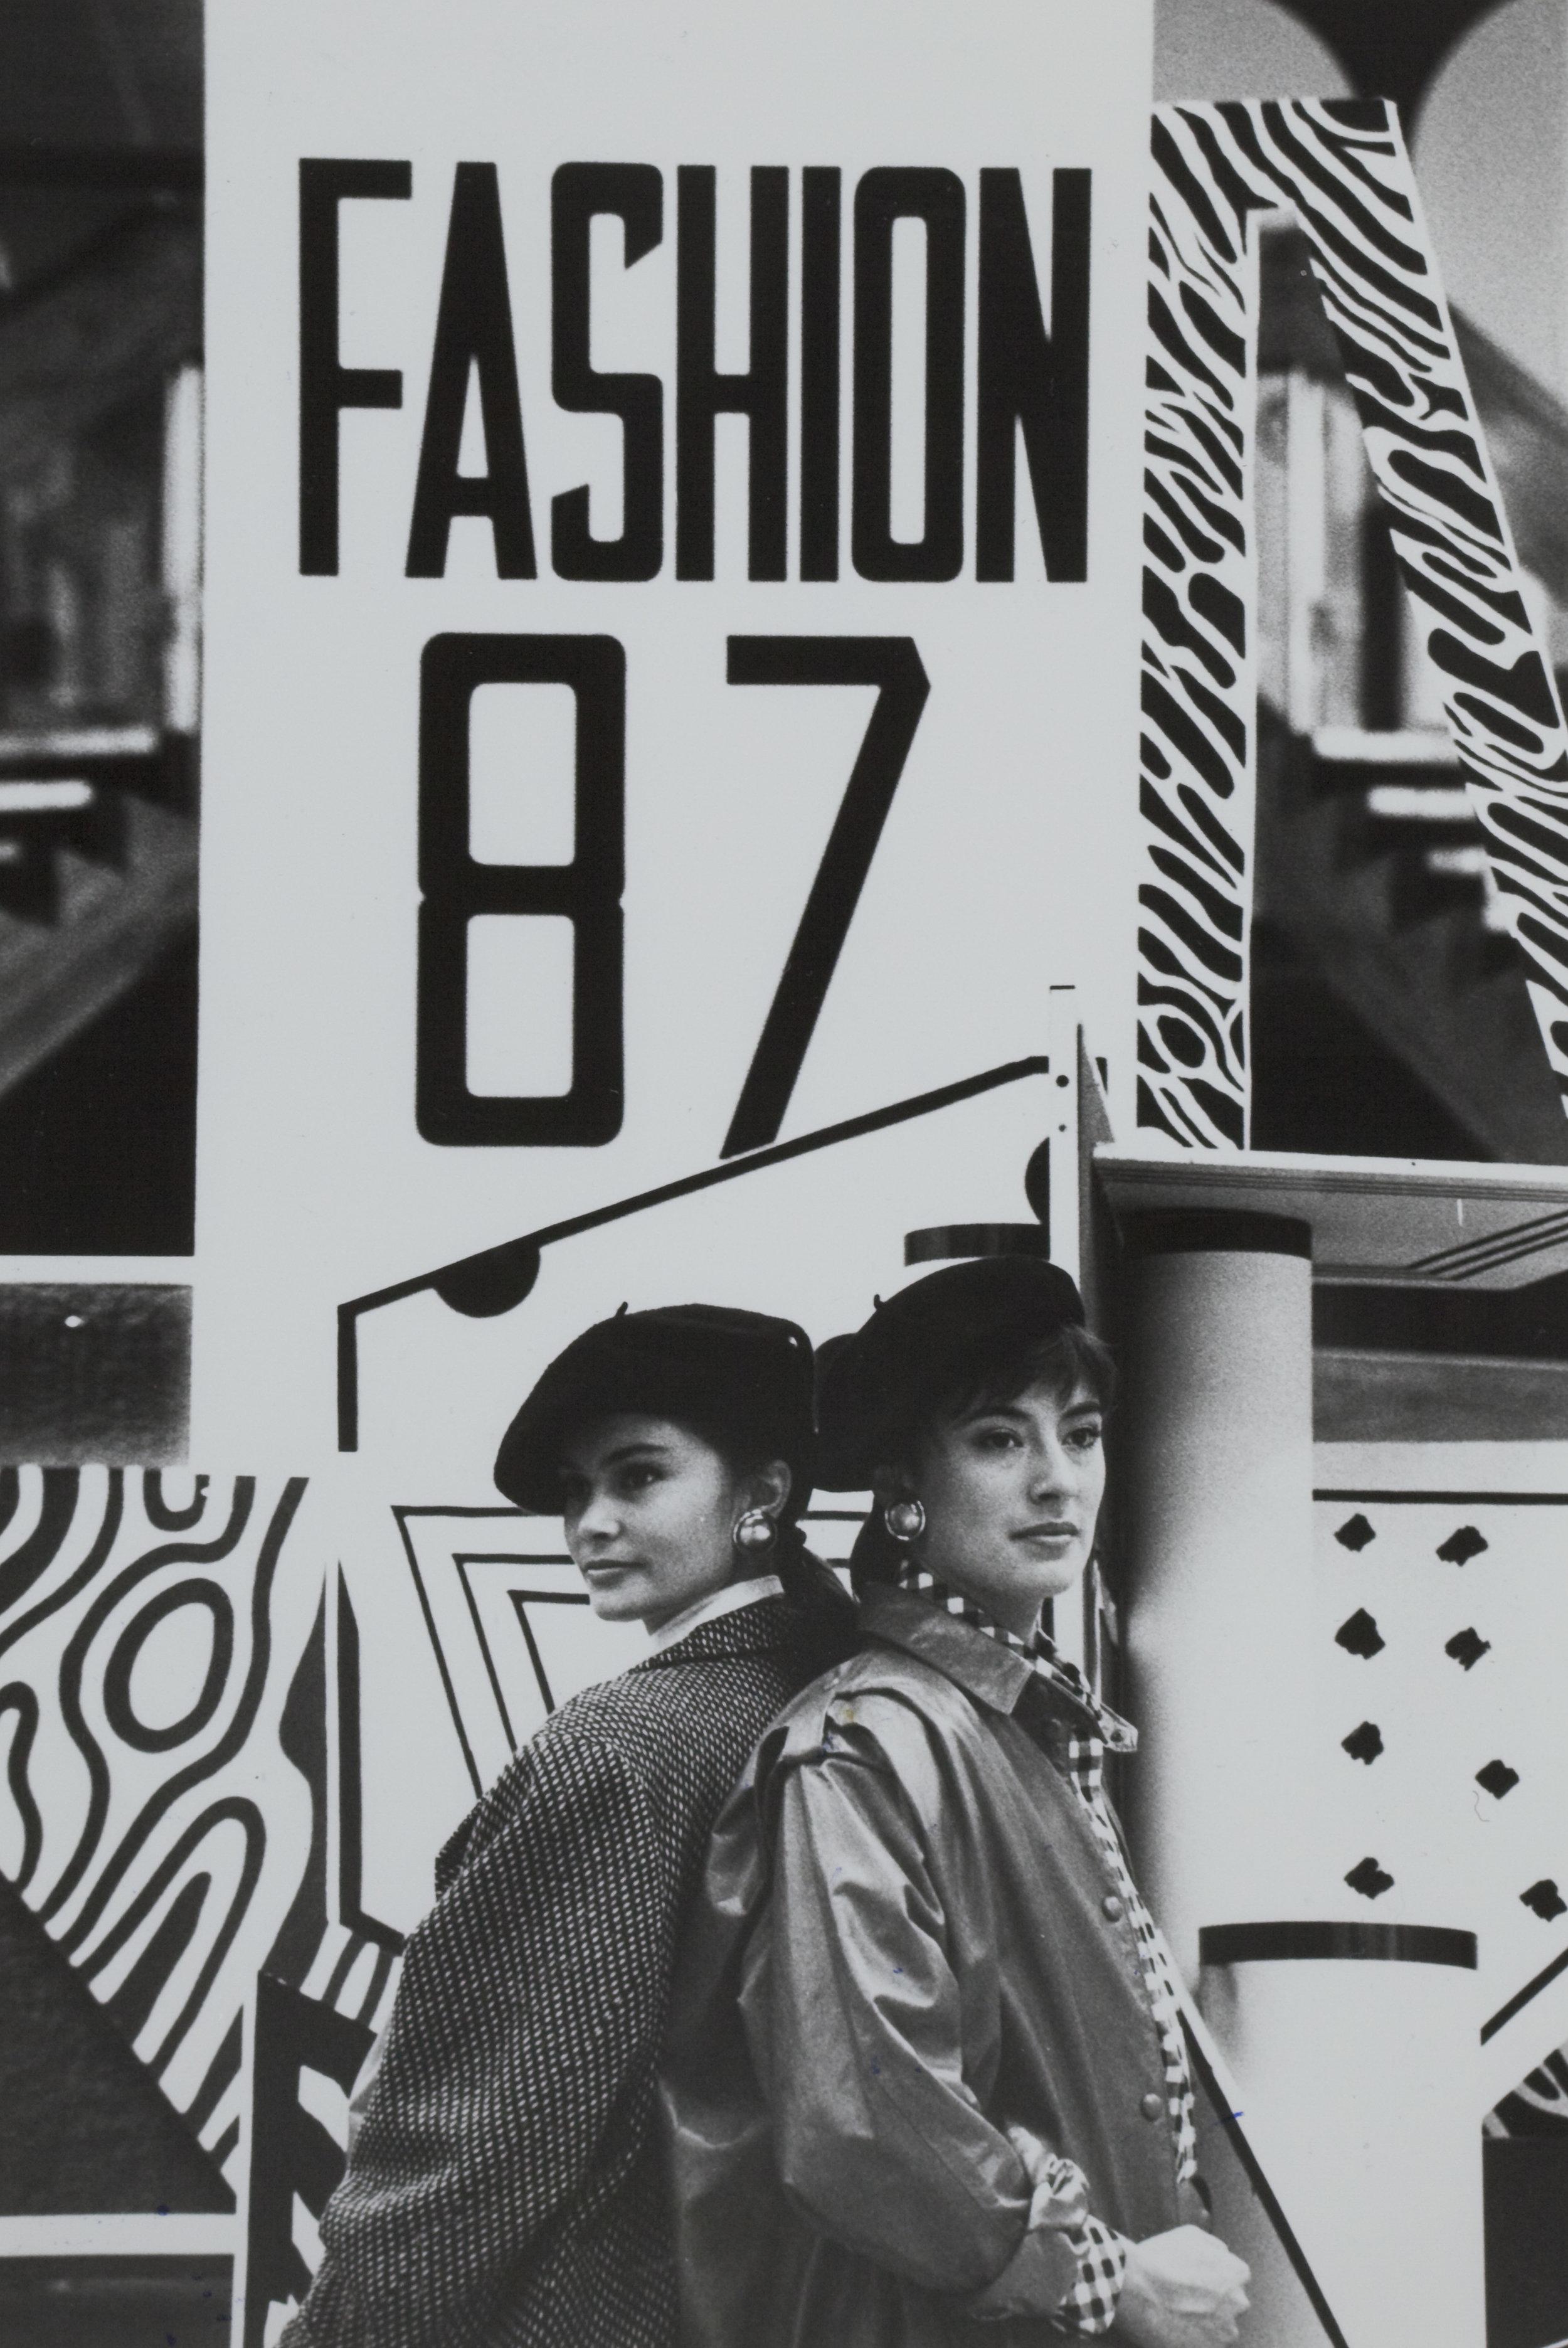 Fashion' 87', Manukau City Centre, 1987. Creator: Unknown Date: March 1987 Footprints 00589